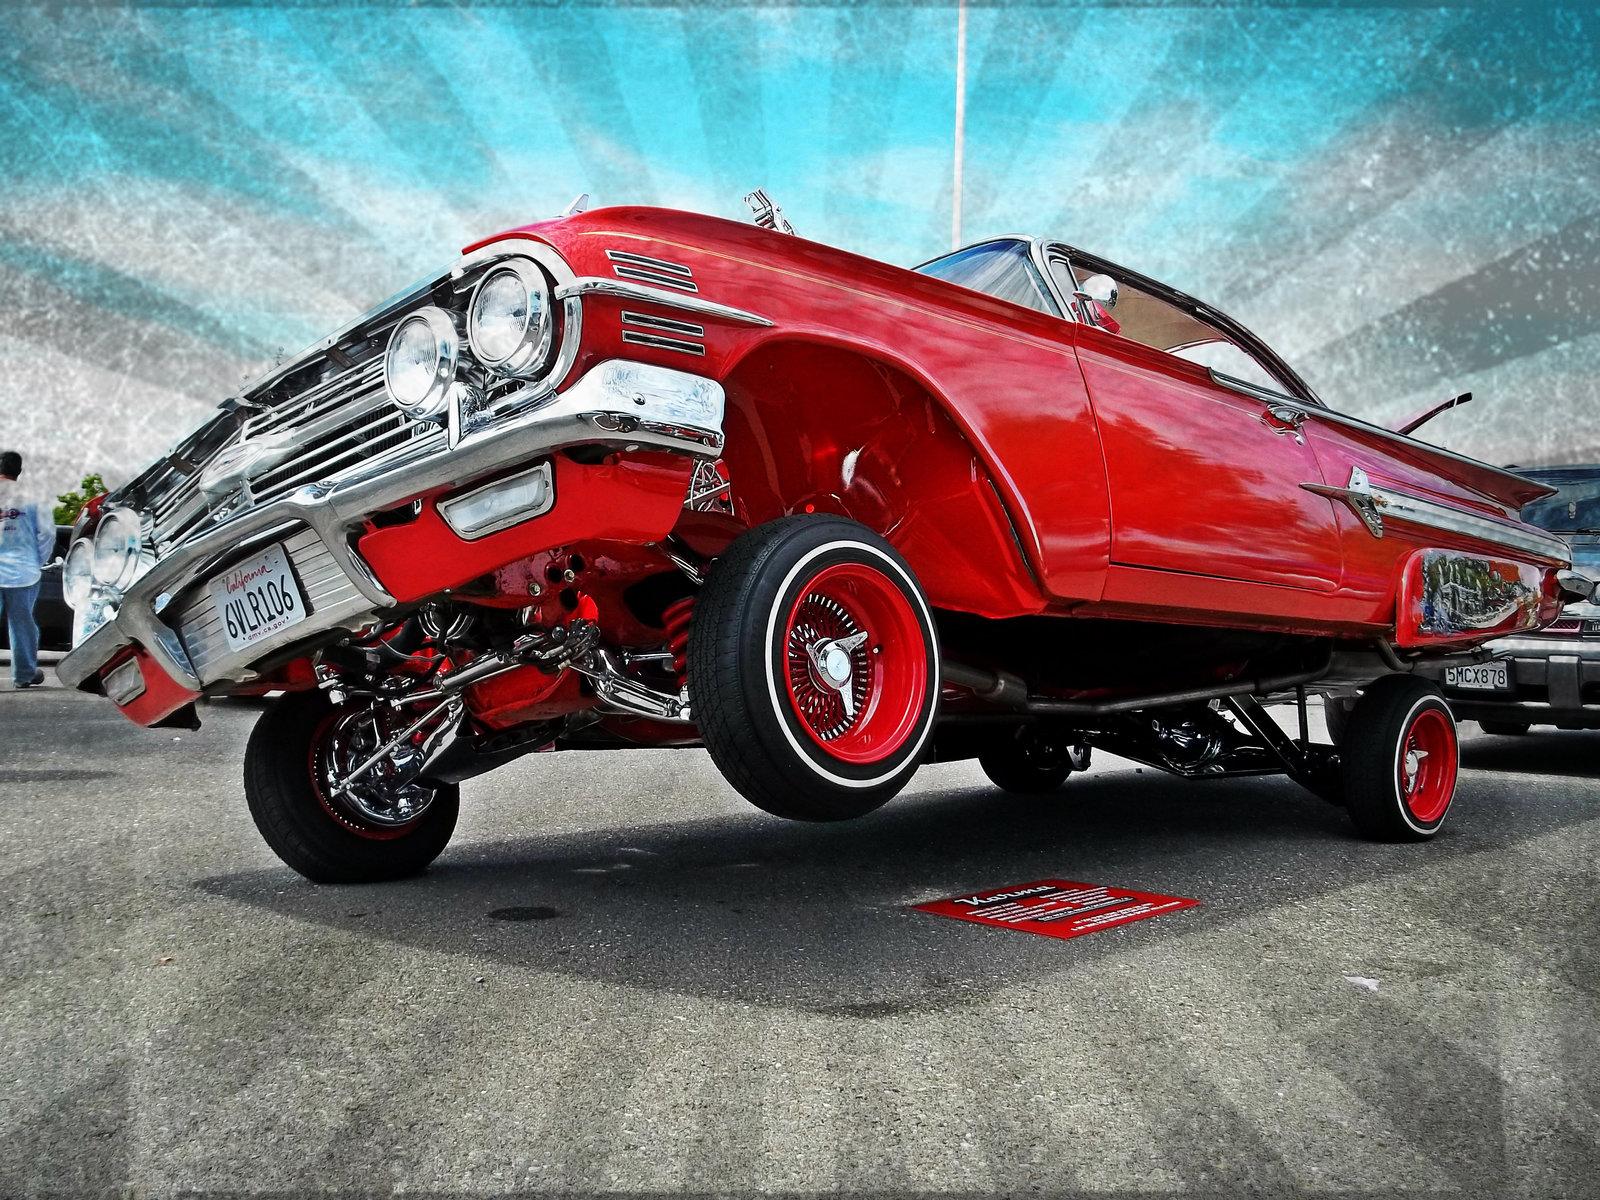 1964 Impala Lowrider Wallpaper Wallpapersafari